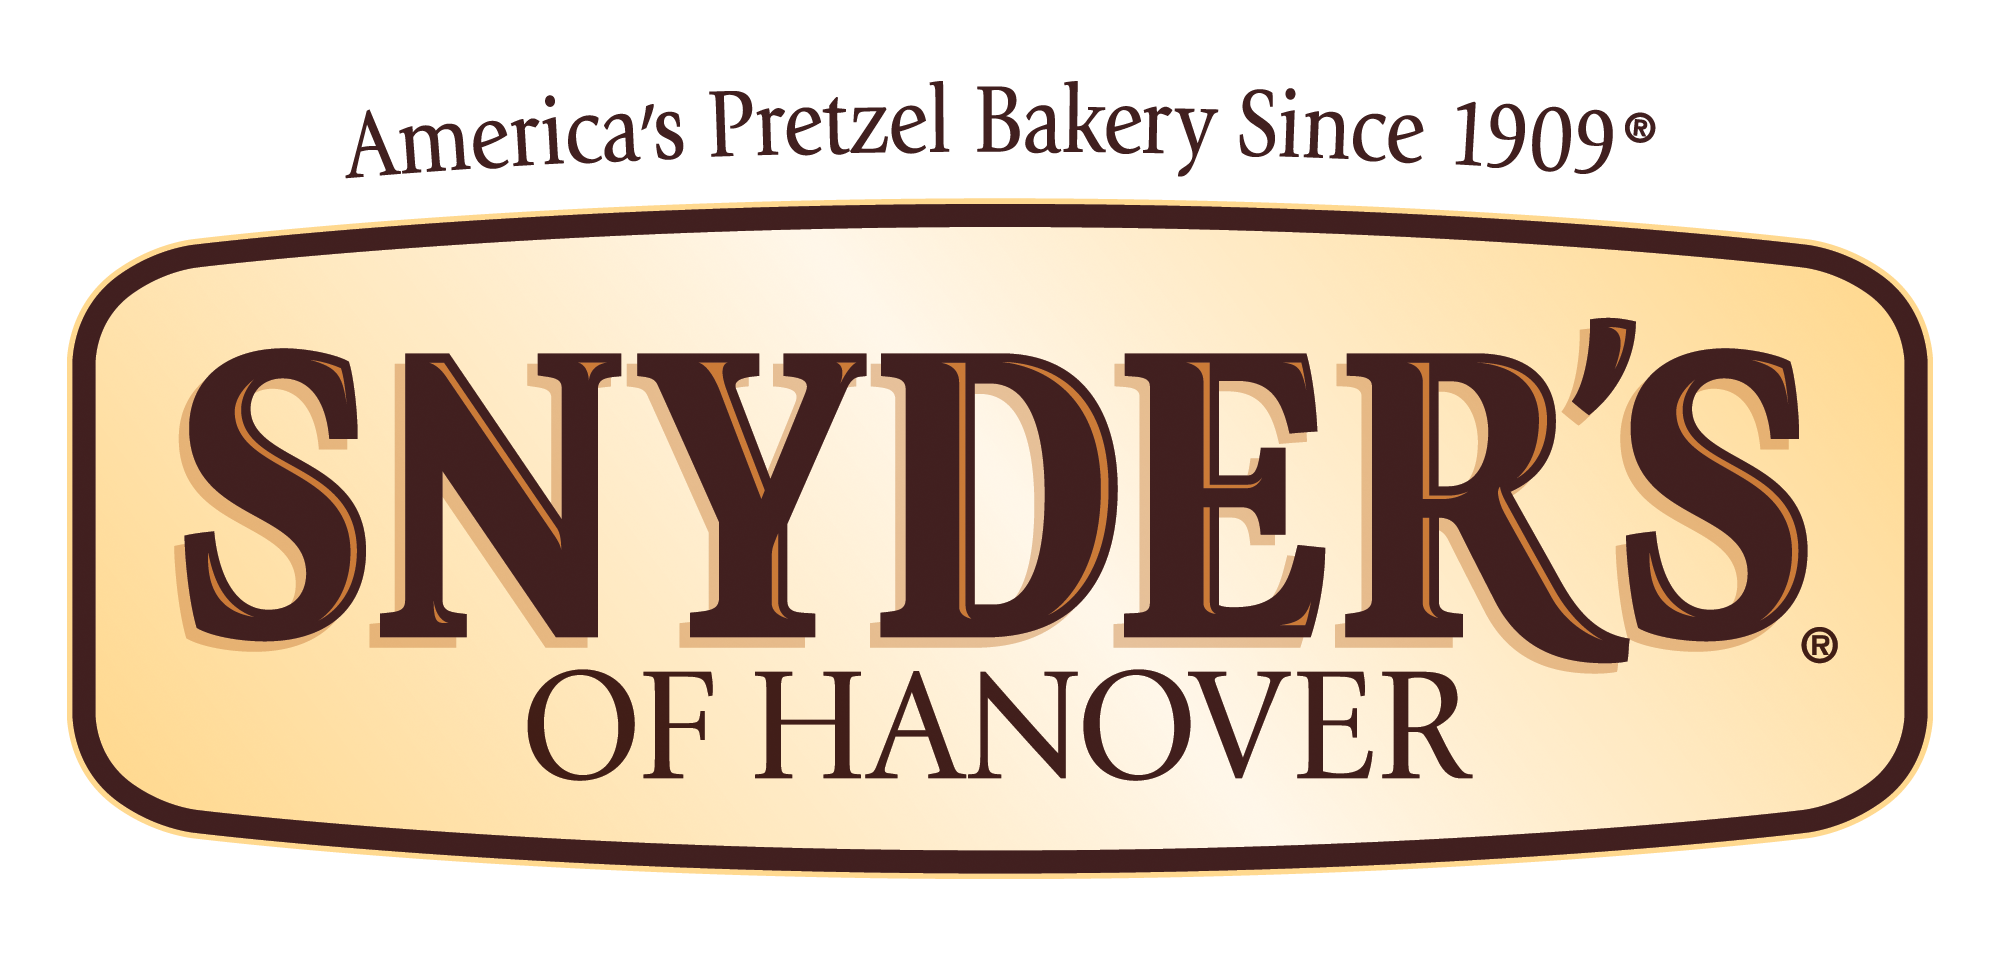 Tour Snyder's of Hanover - Snyder's of Hanover